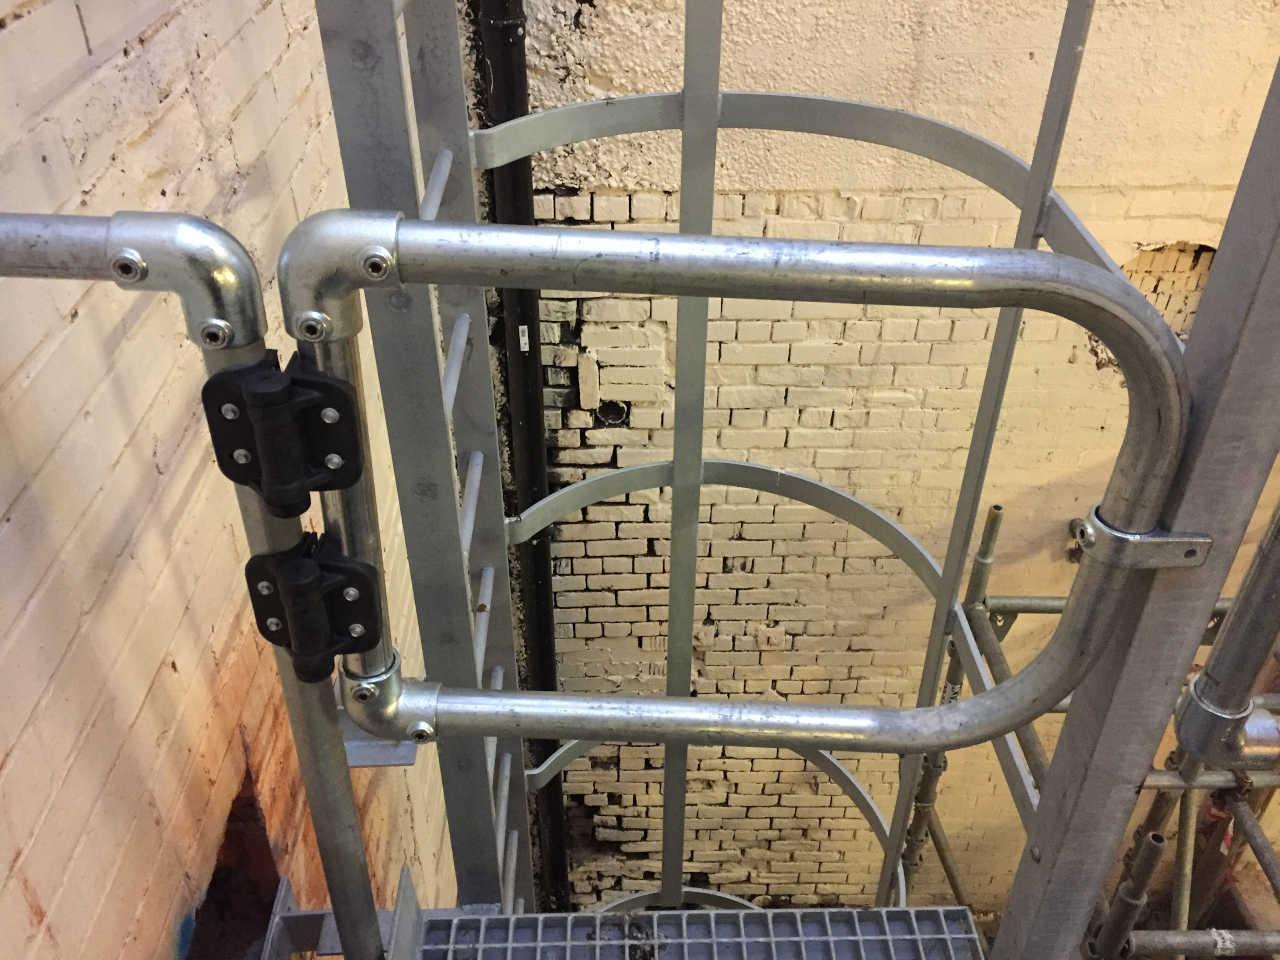 Cargills Ladder